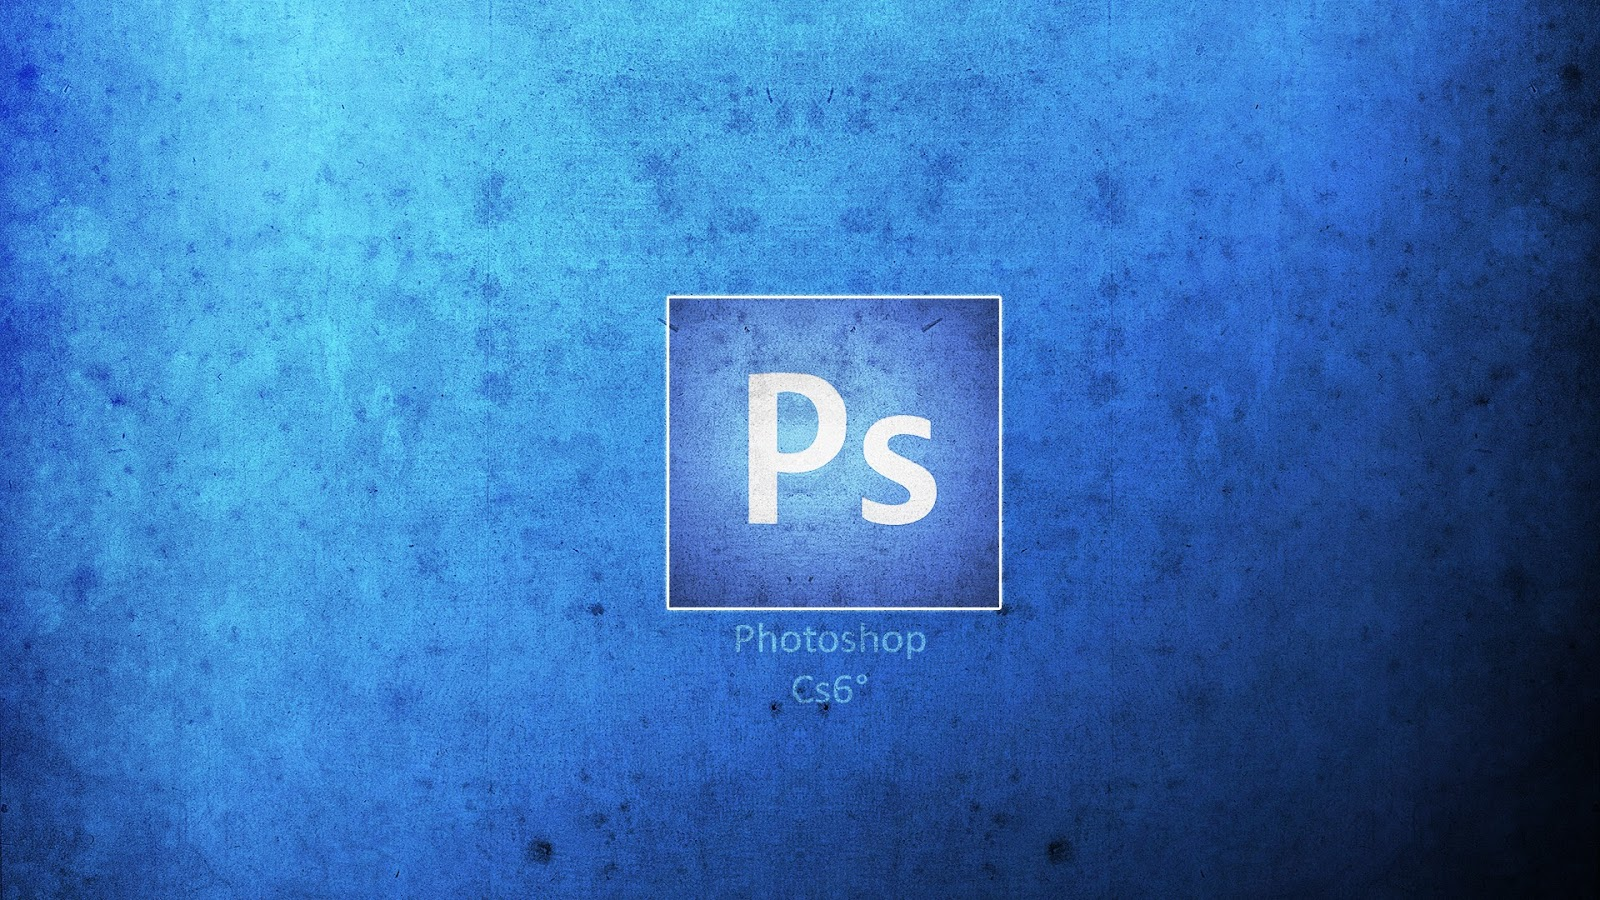 Photoshop Desktop Wallpaper - HD Wallpapers - 9to5Wallpapers